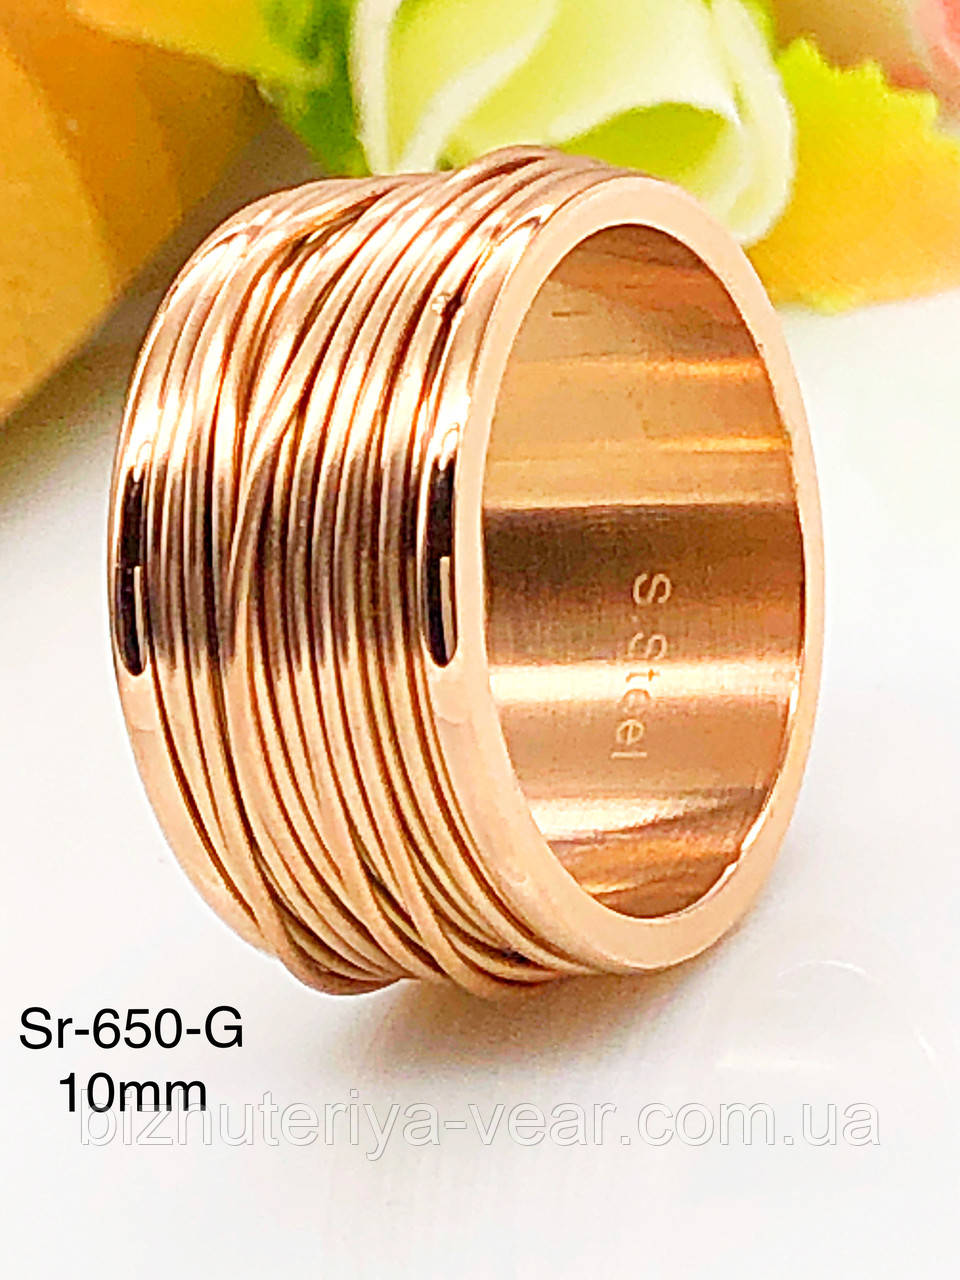 КОЛЬЦО STAINLEES STEEL(ПРЕМИУМ) Sr-650(7,8,9,10)